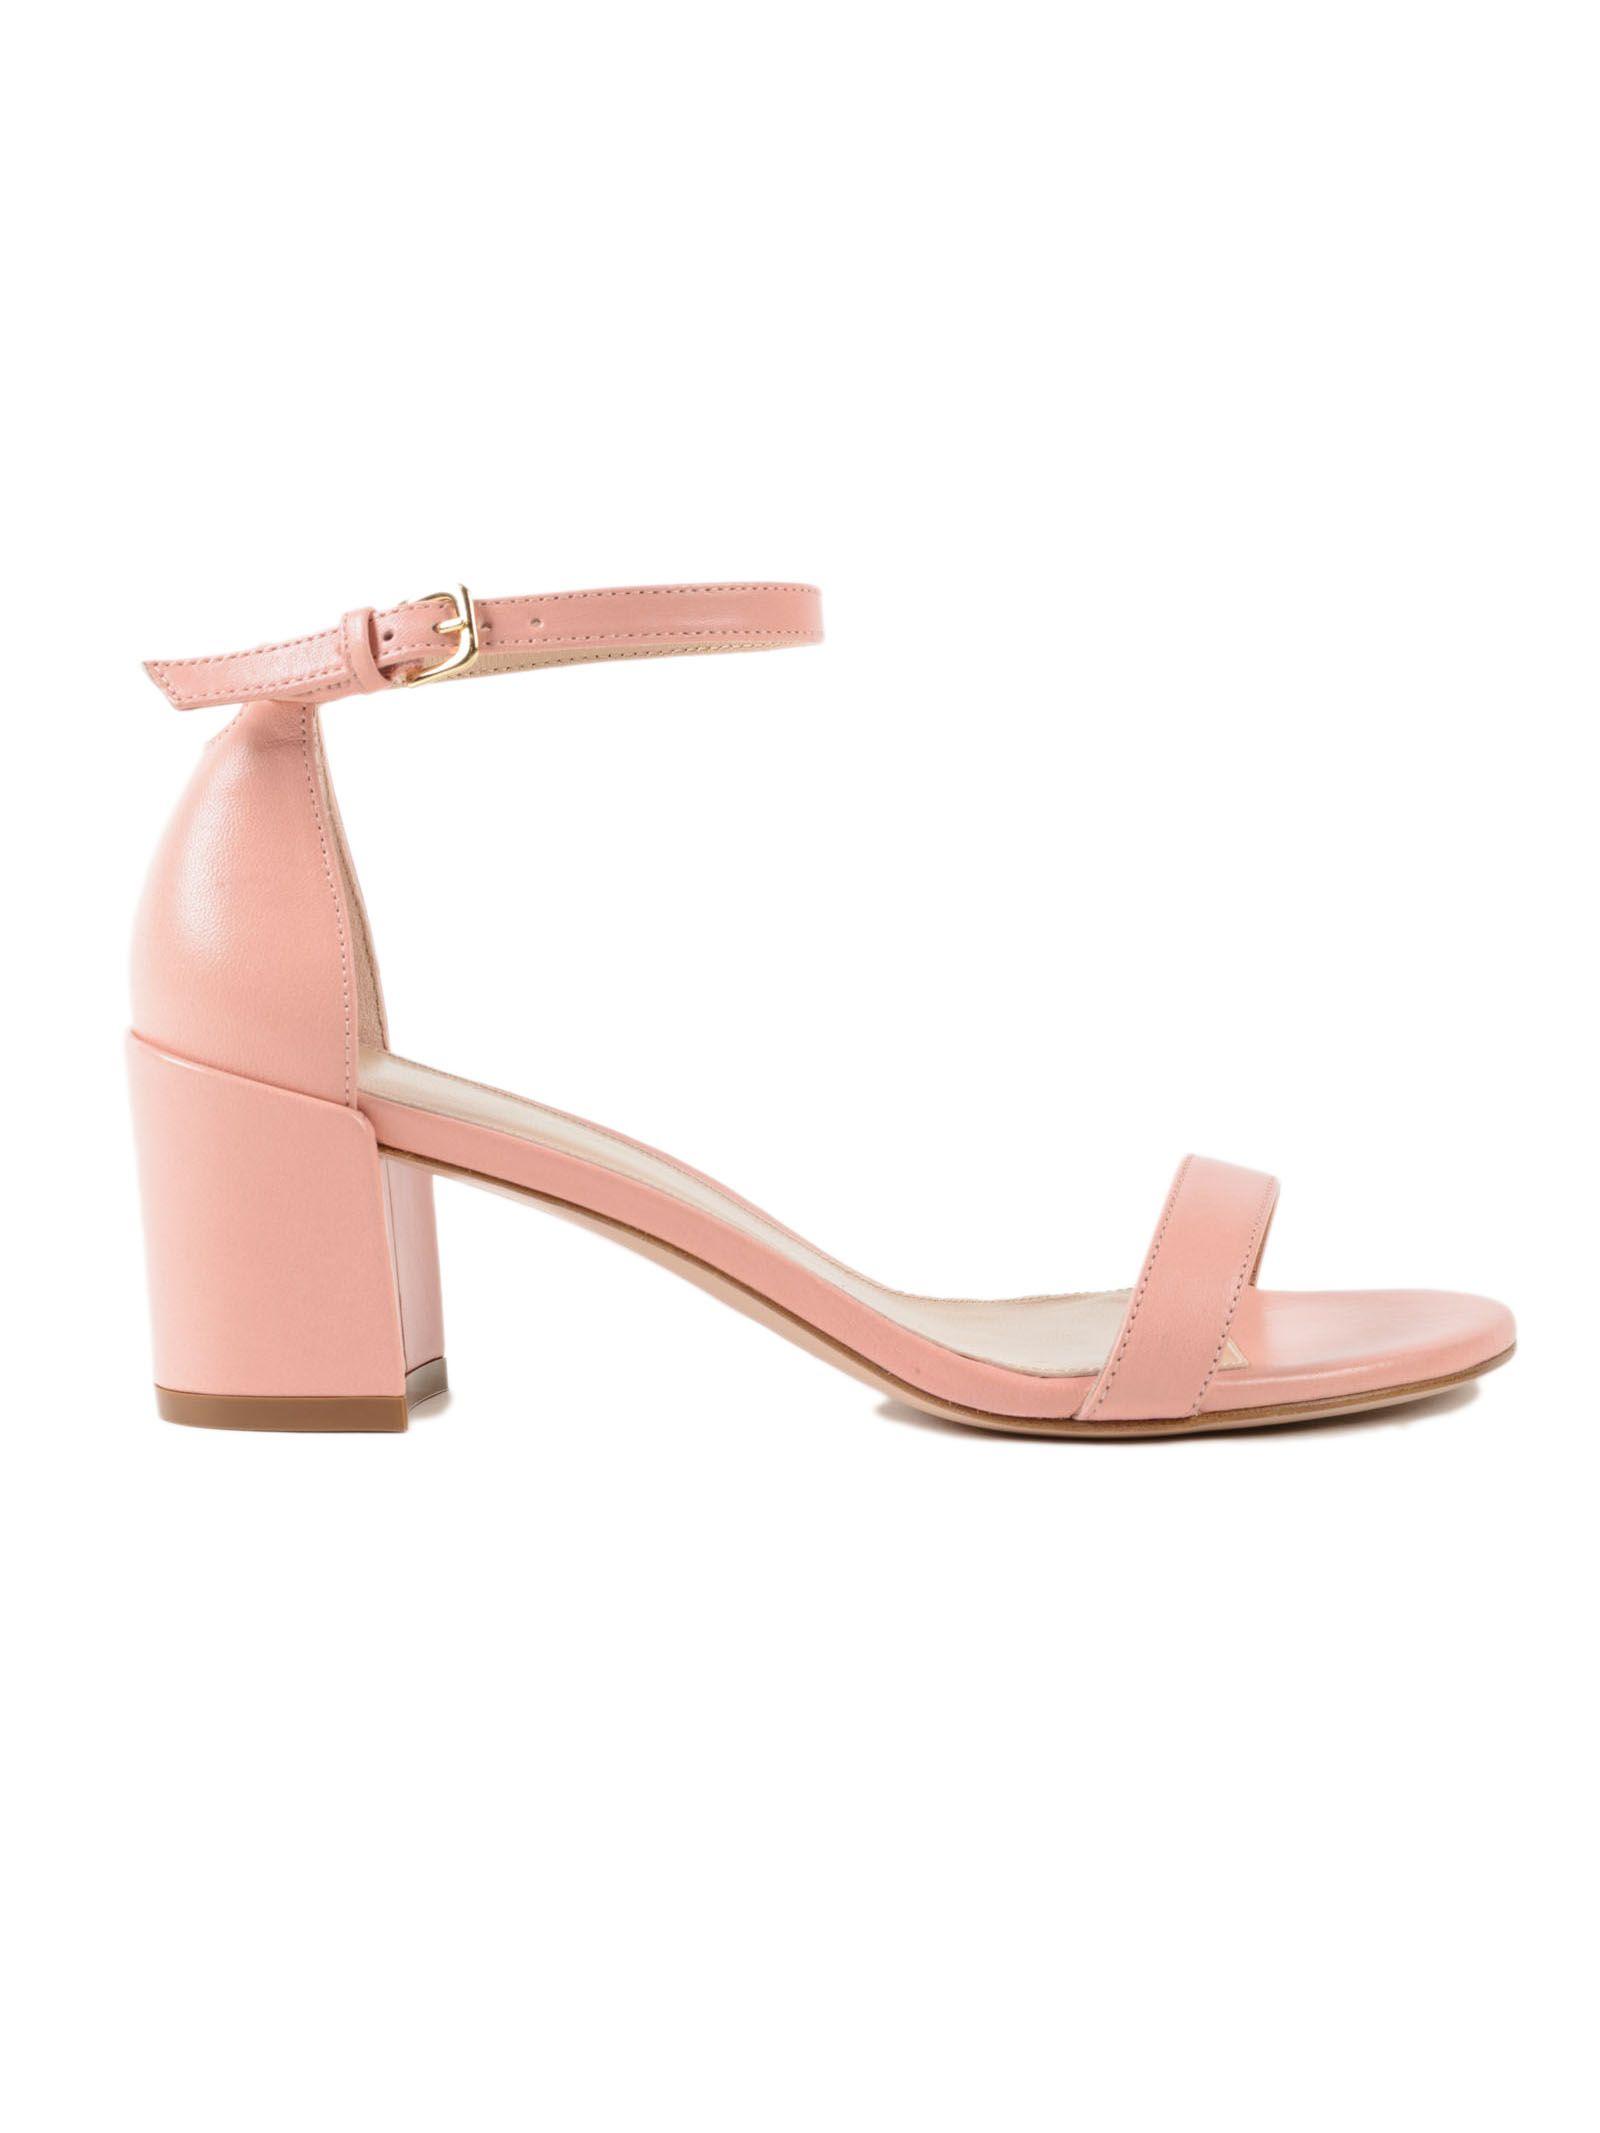 Stuart Weitzman Simple Nappa Sandals